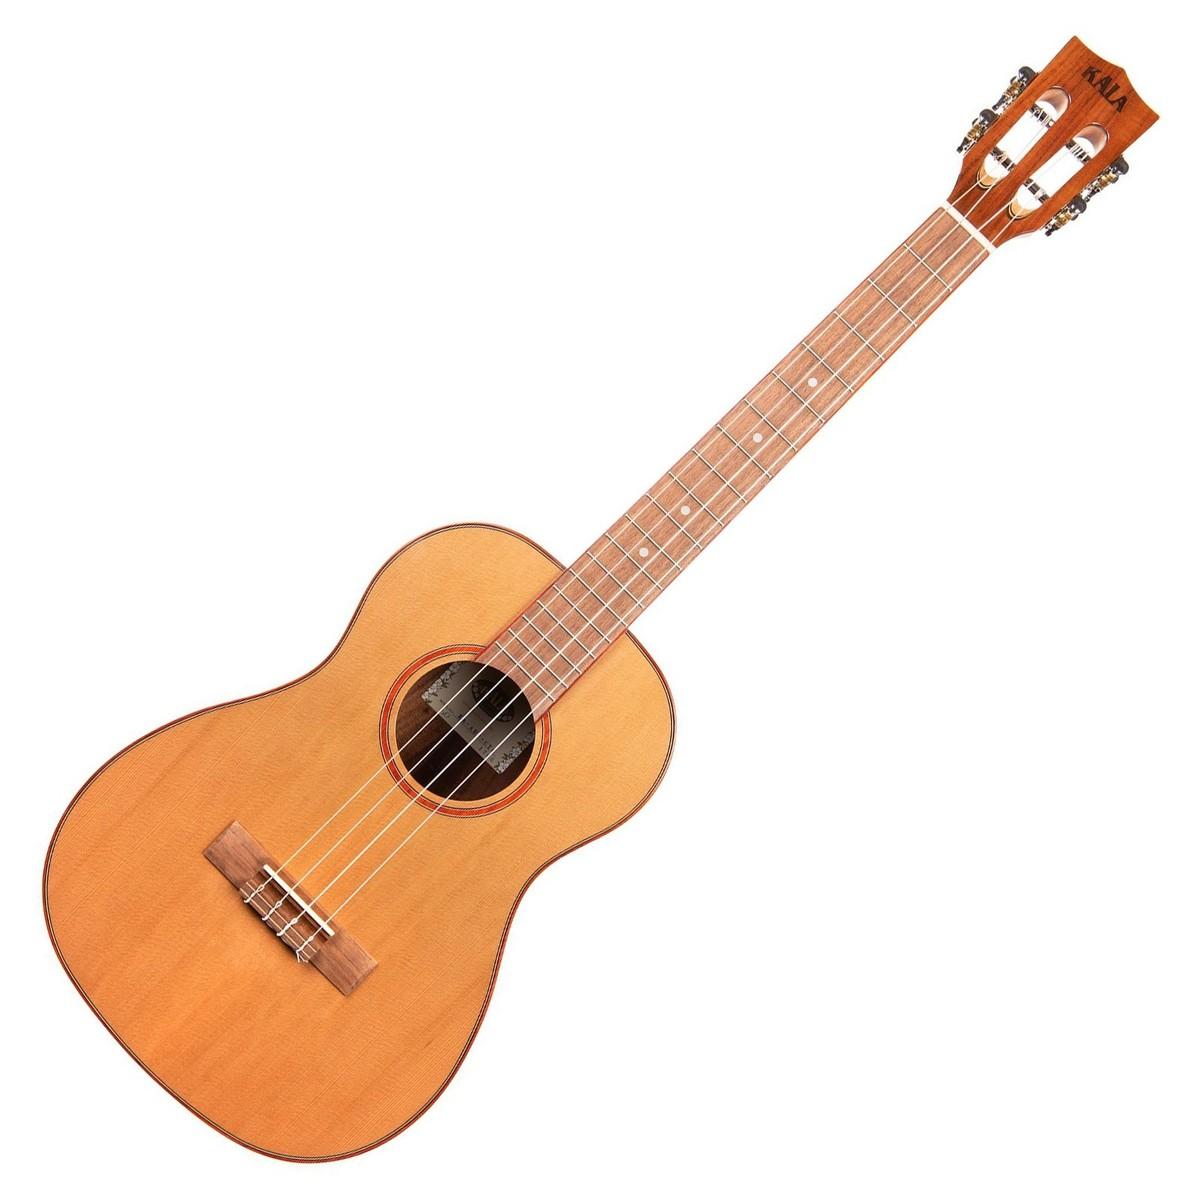 kala ka abp ctg cedar top baritone ukulele gloss at gear4music. Black Bedroom Furniture Sets. Home Design Ideas